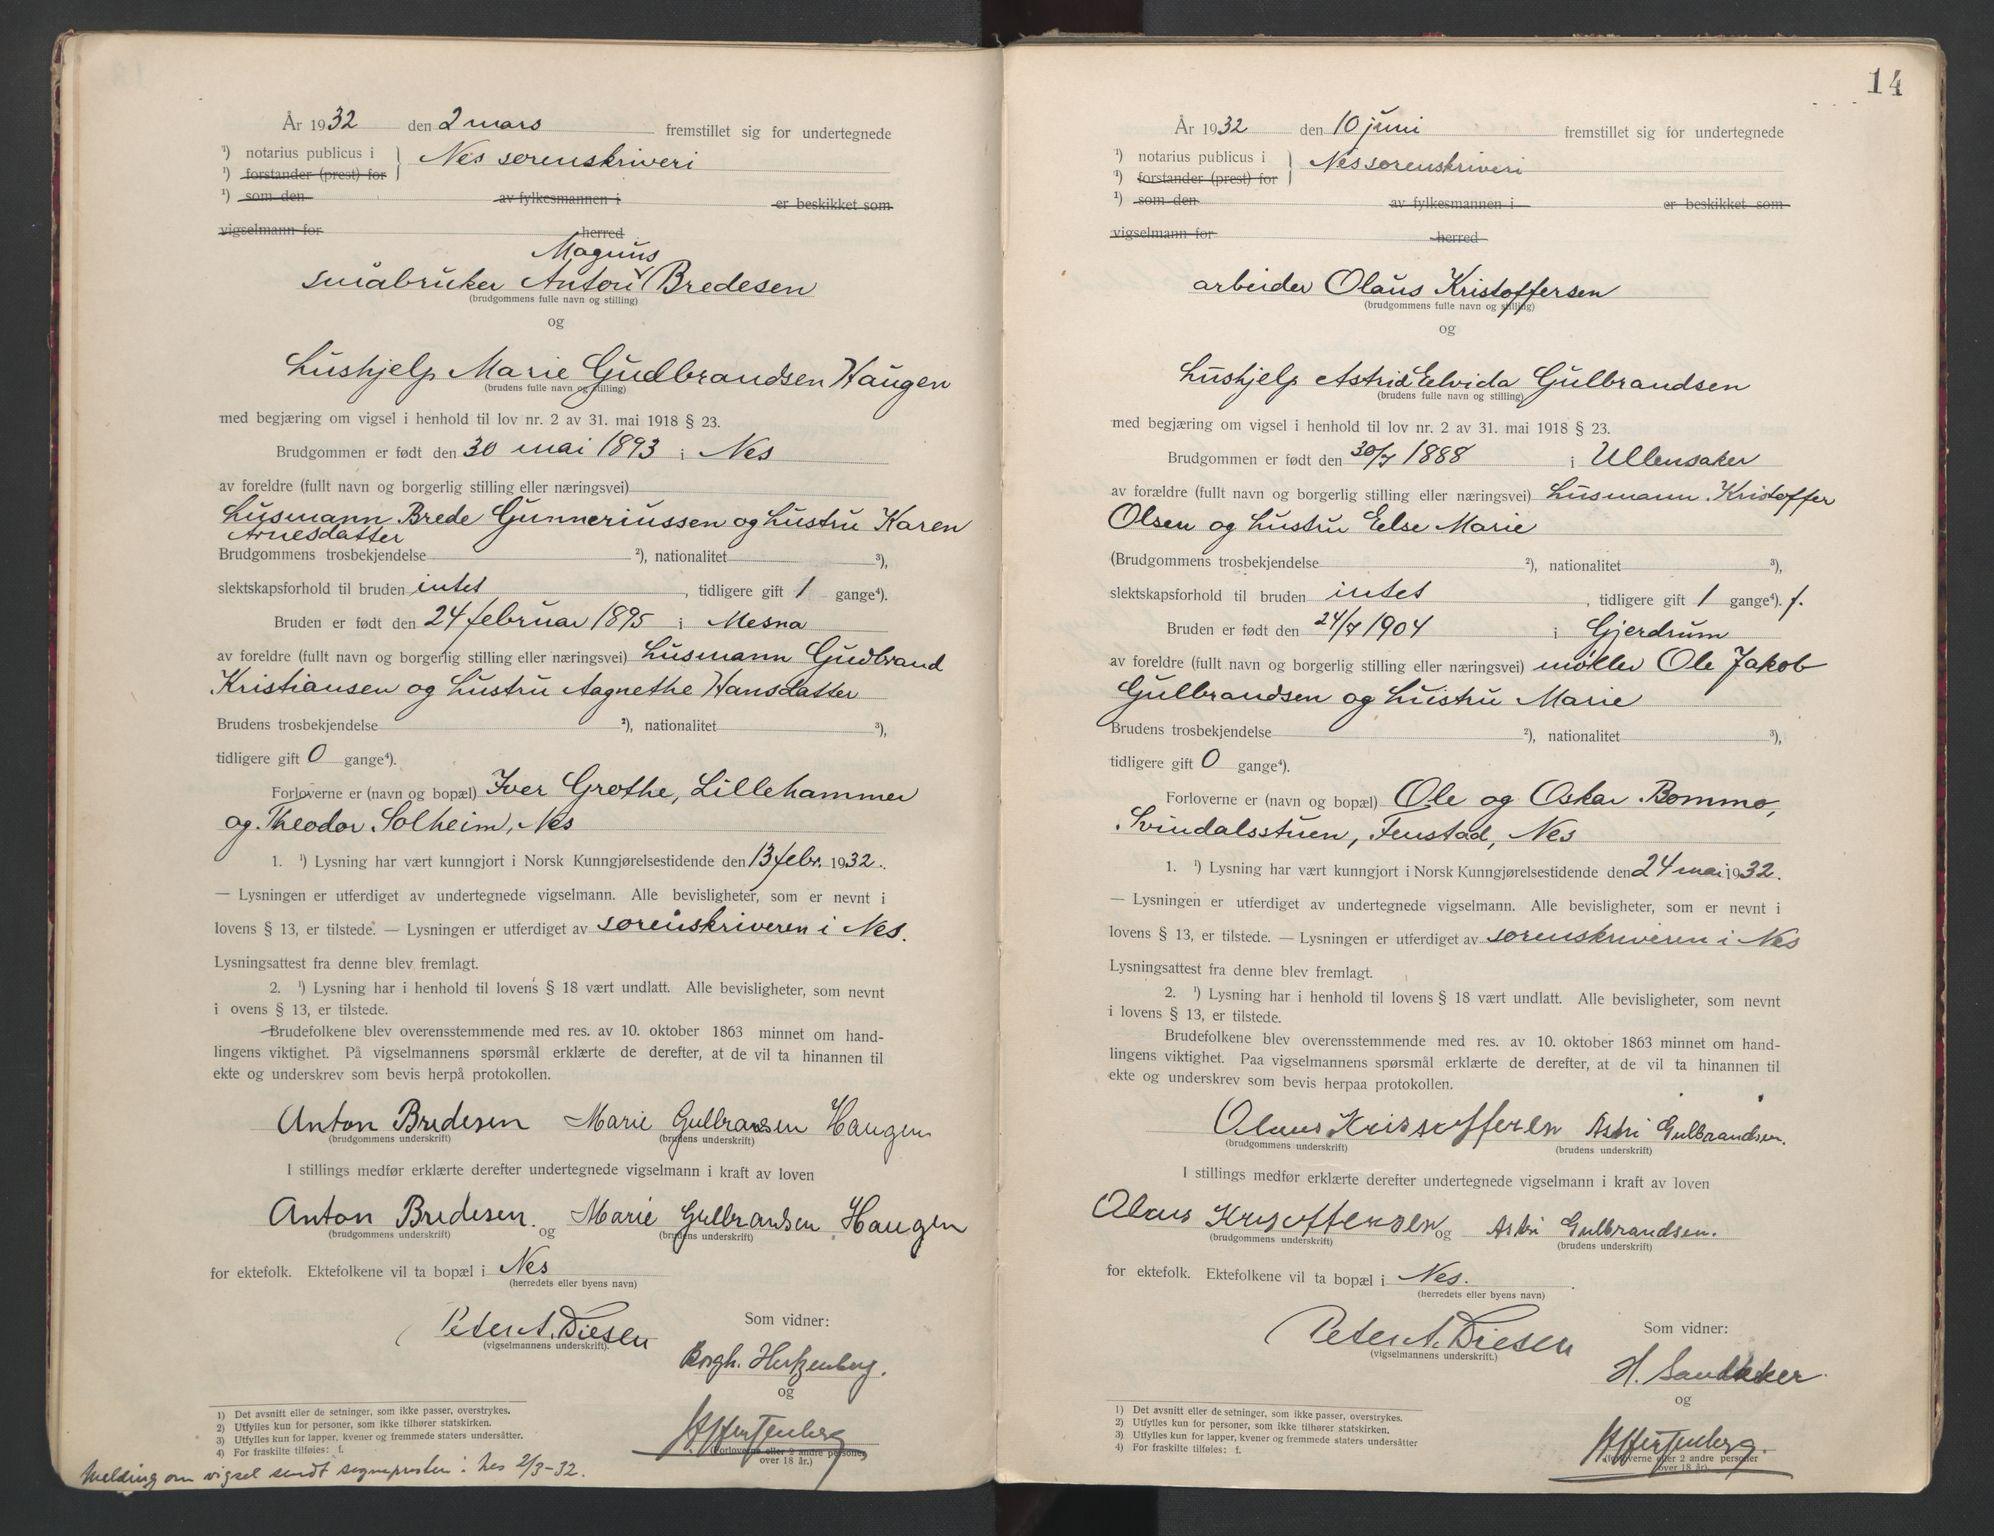 SAO, Nes tingrett, L/Lc/Lca/L0001: Vigselbok, 1920-1943, s. 14